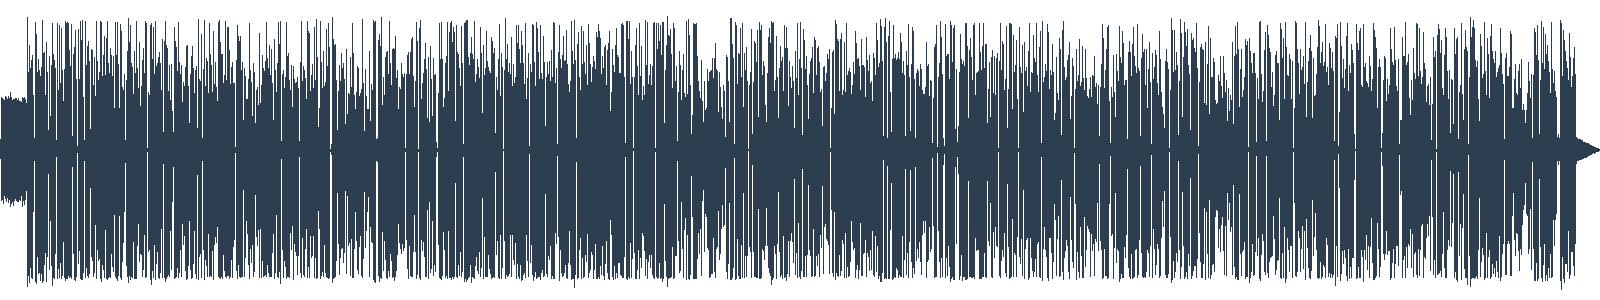 #78 GIRO ŠPECIÁL: 4. etapa - Wellens všetko zafixoval waveform